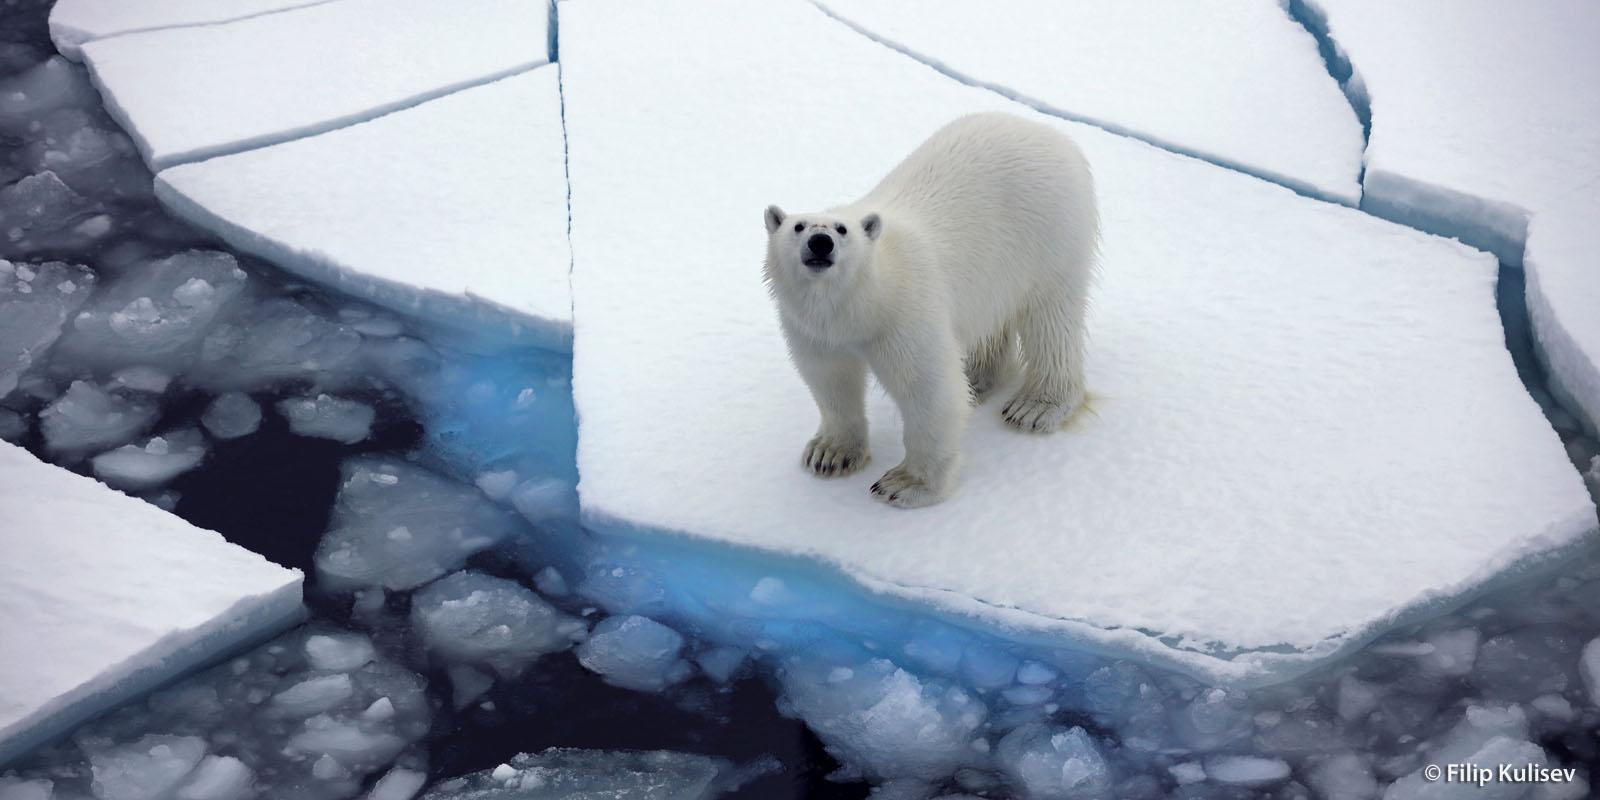 Kuzey Kutbu 90 Derecede Saat Kaç Olur